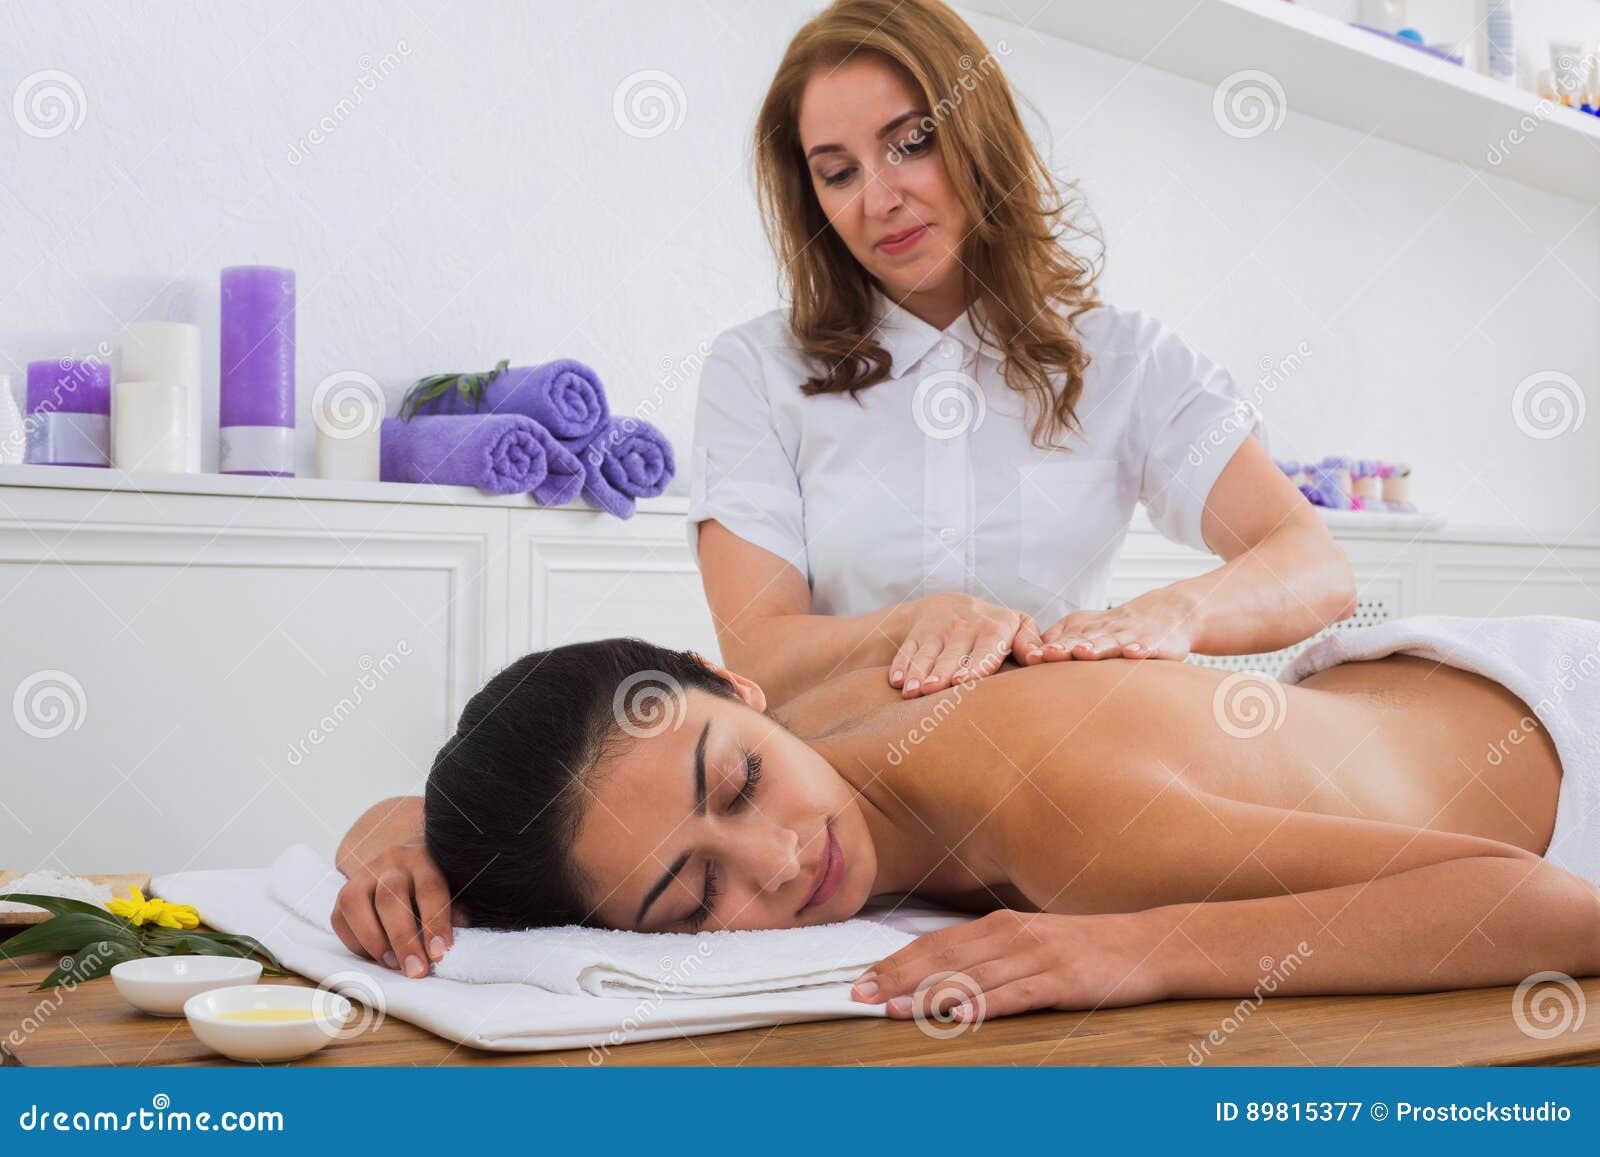 Healthy Body Spa Cancun Massage Parlors